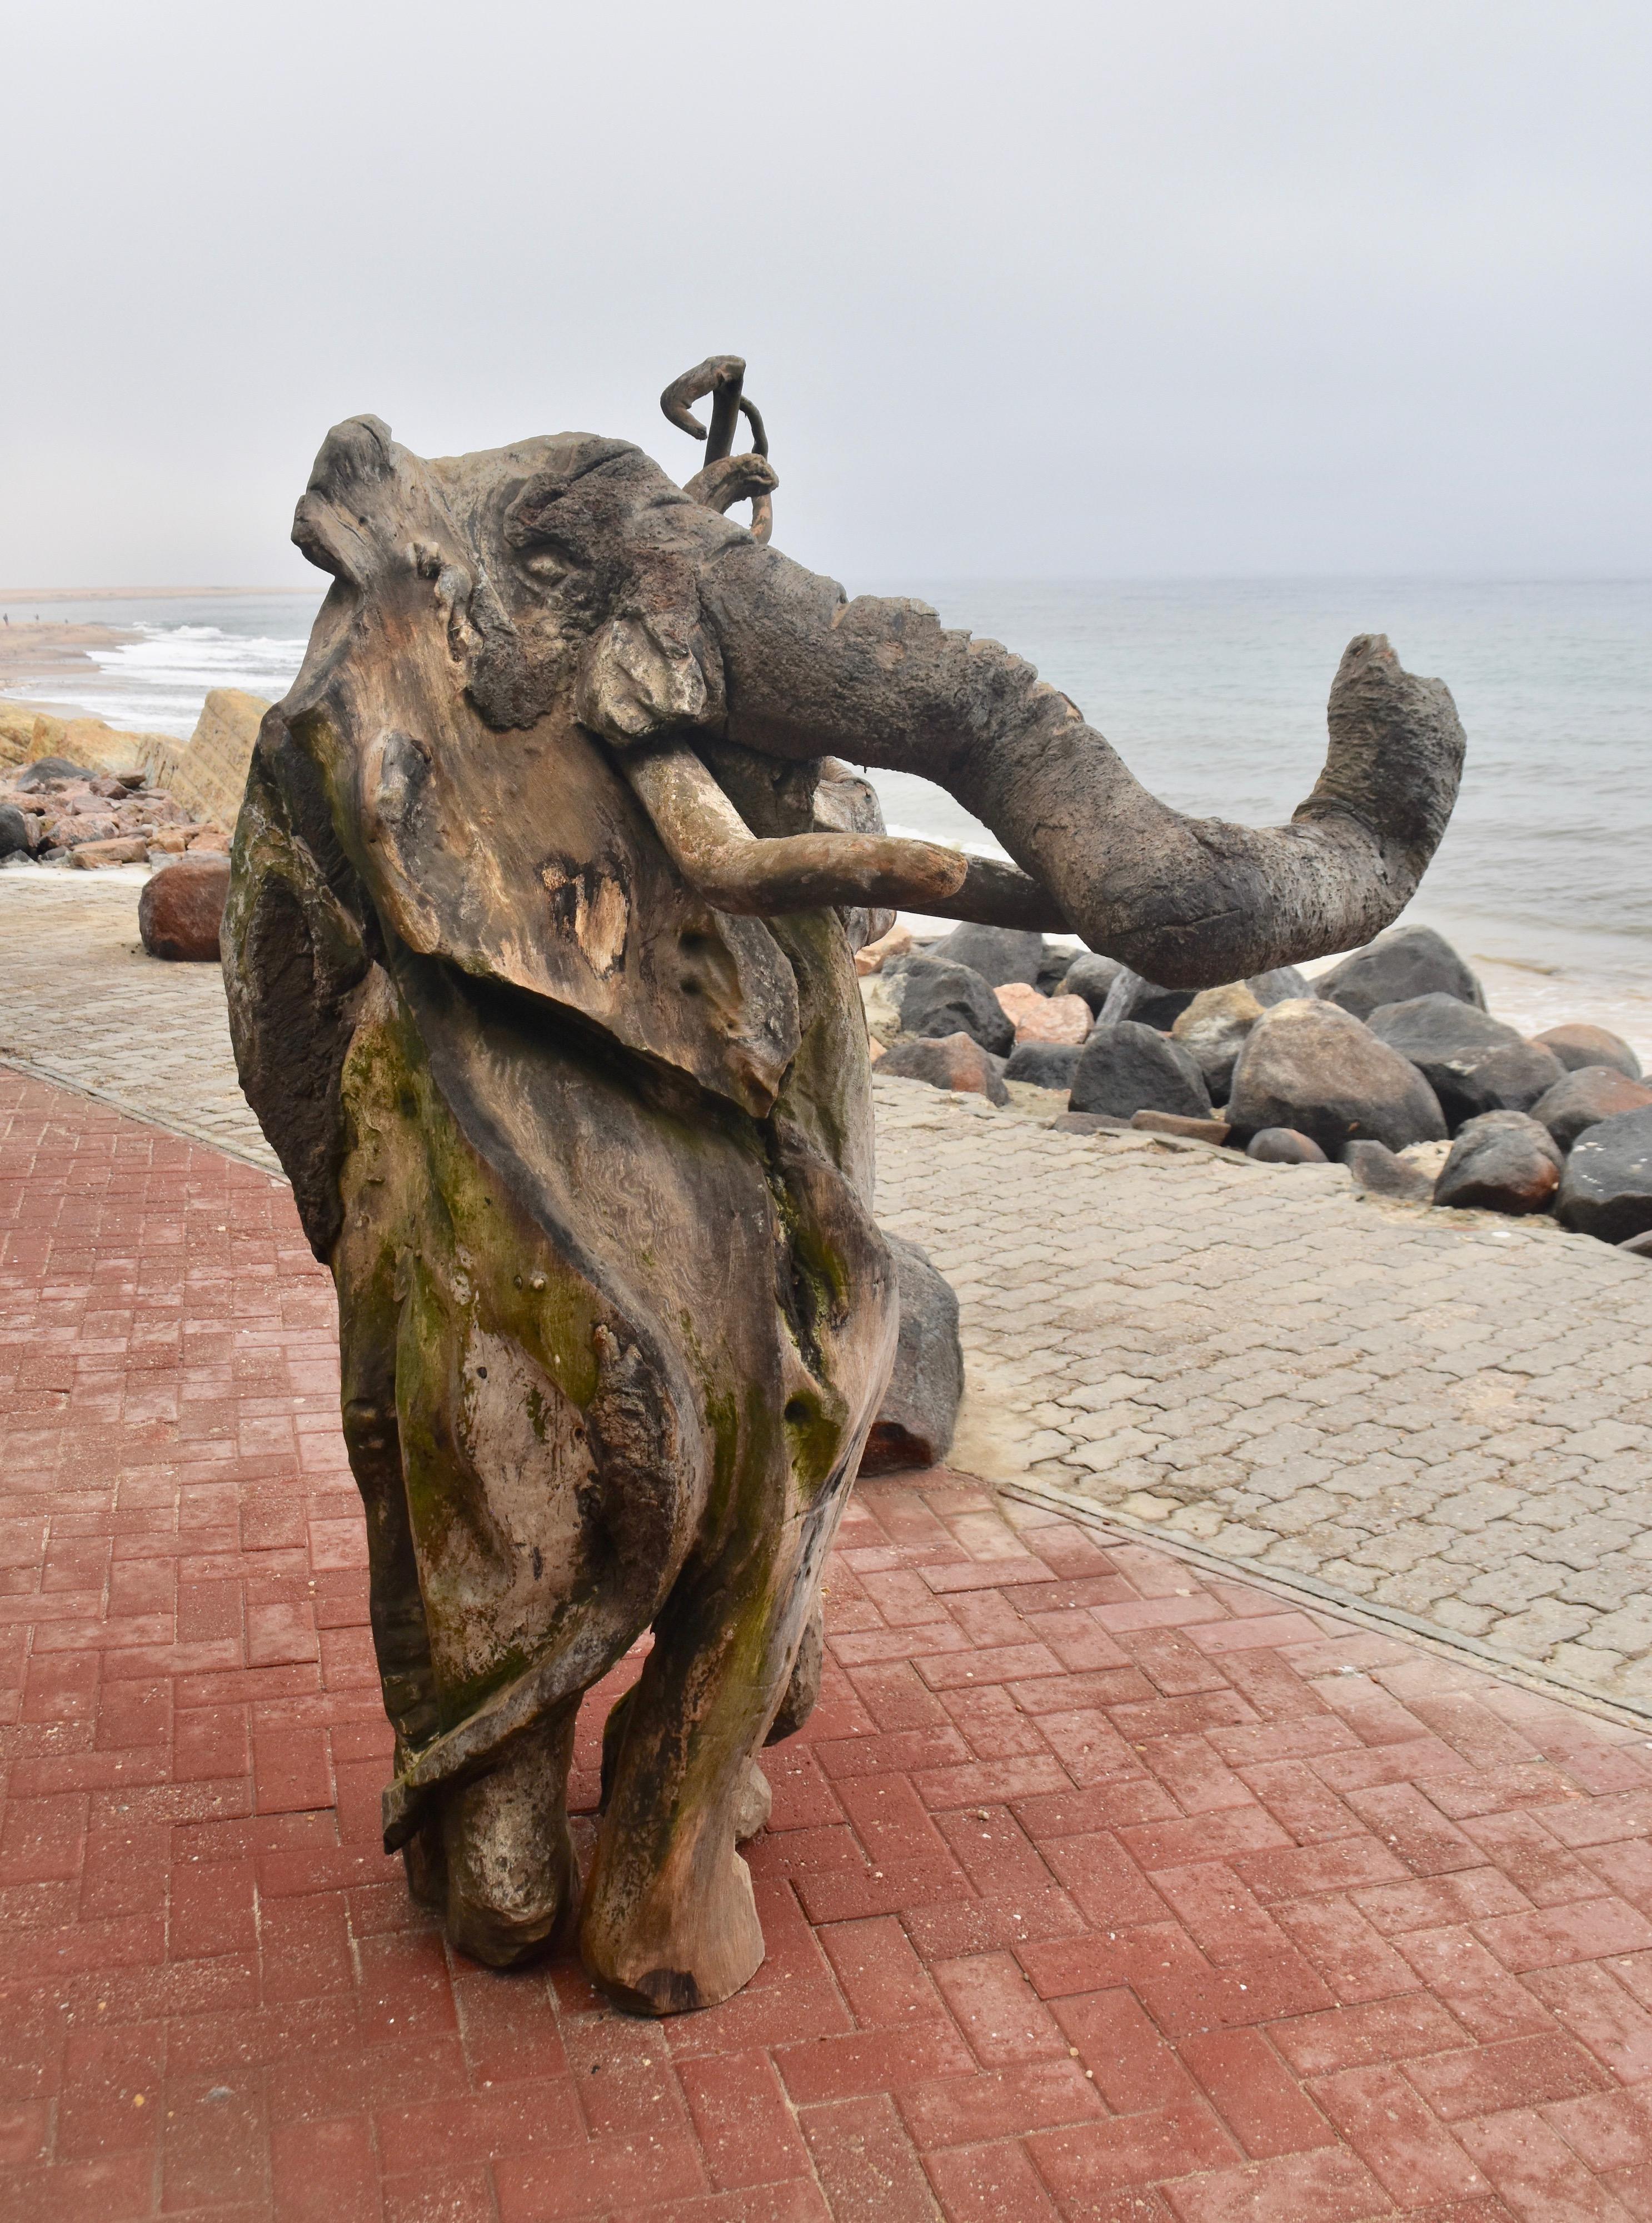 Driftwood Elephant, Swakopmund